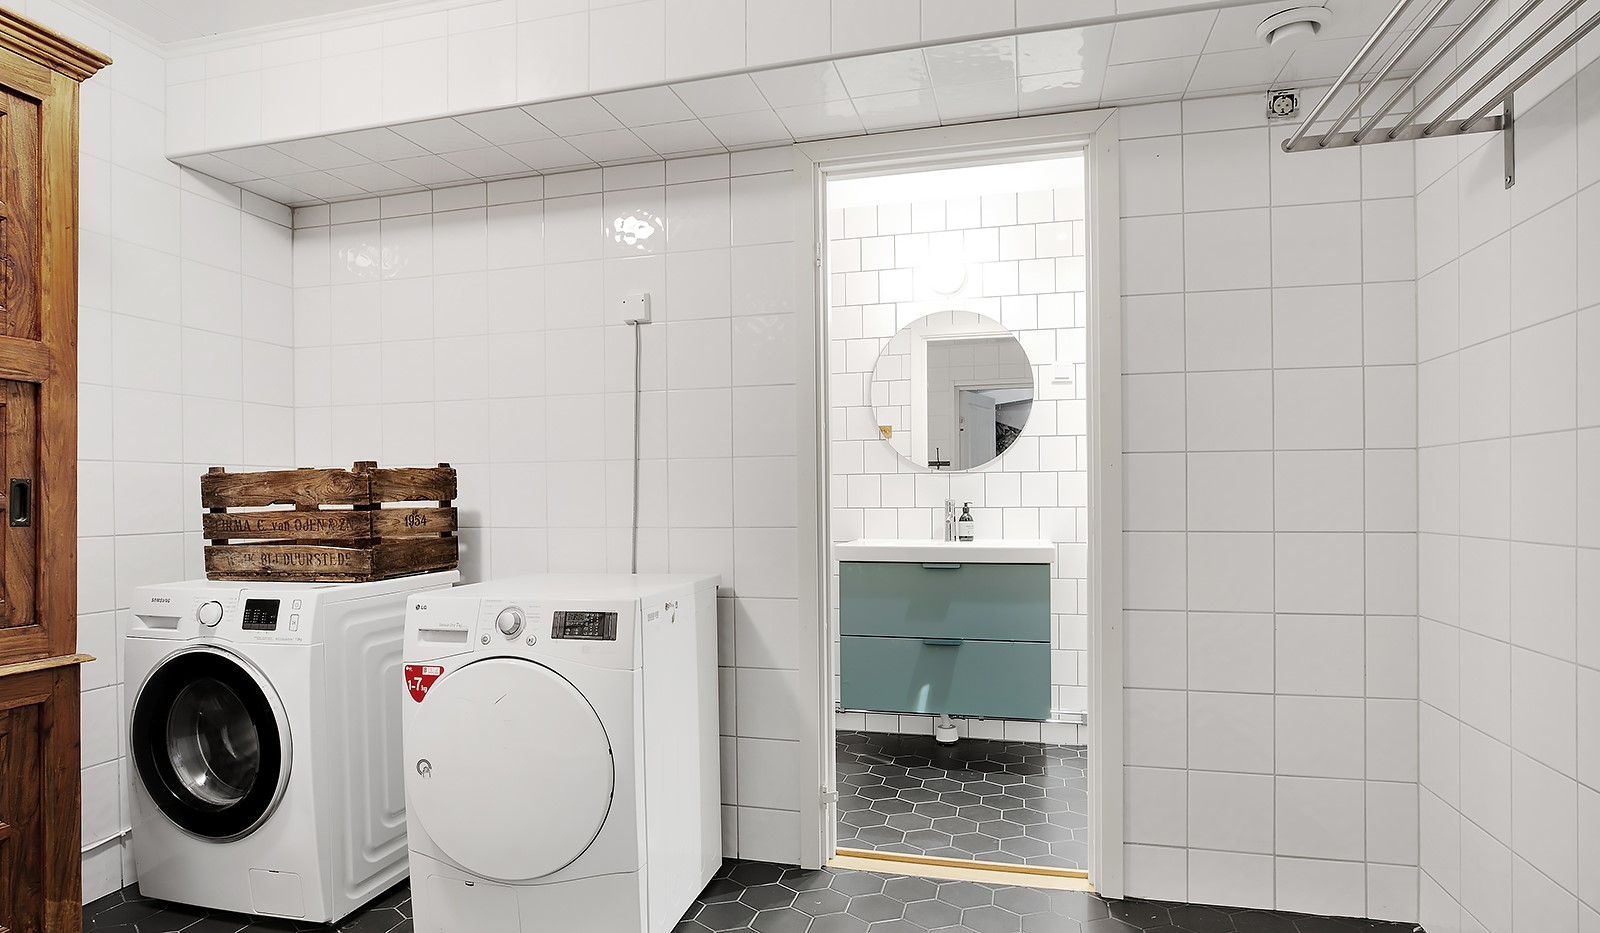 Hallundavägen 127 - Tvättstuga